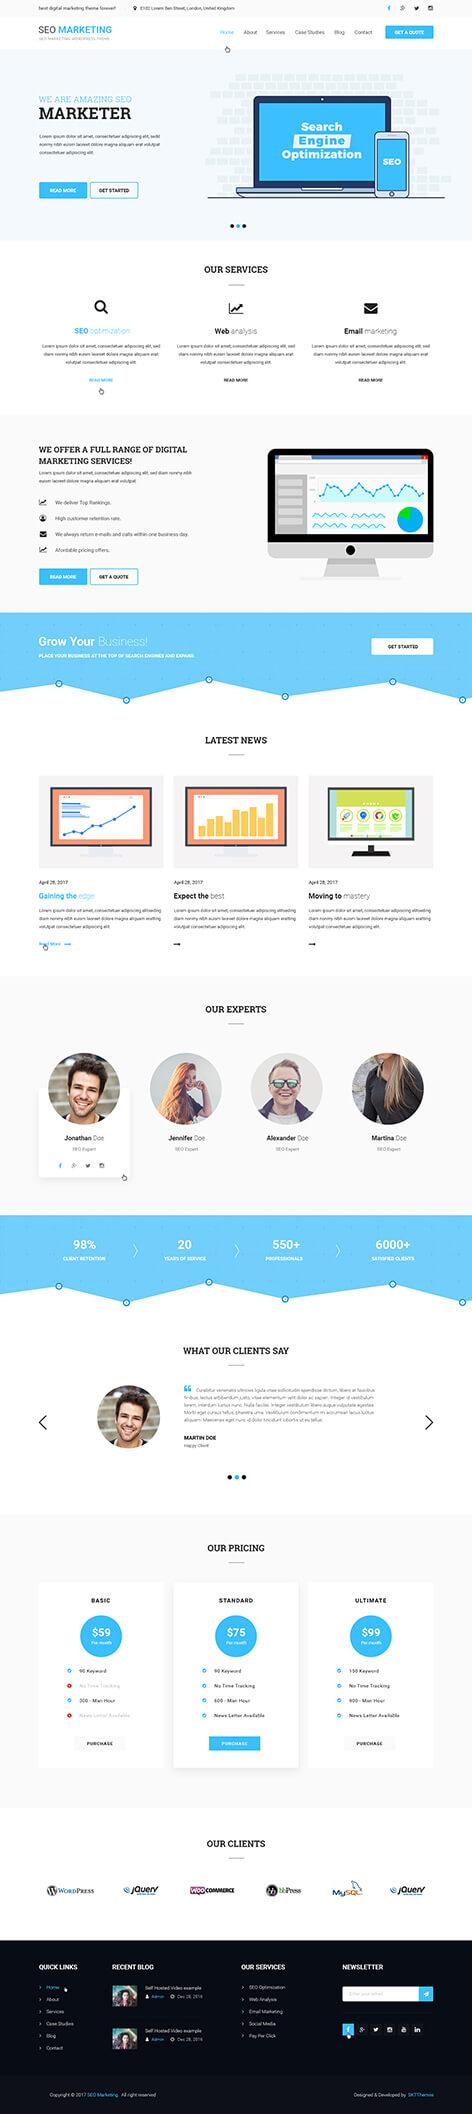 seo marketing wordpress theme1 - SEO-Marketing